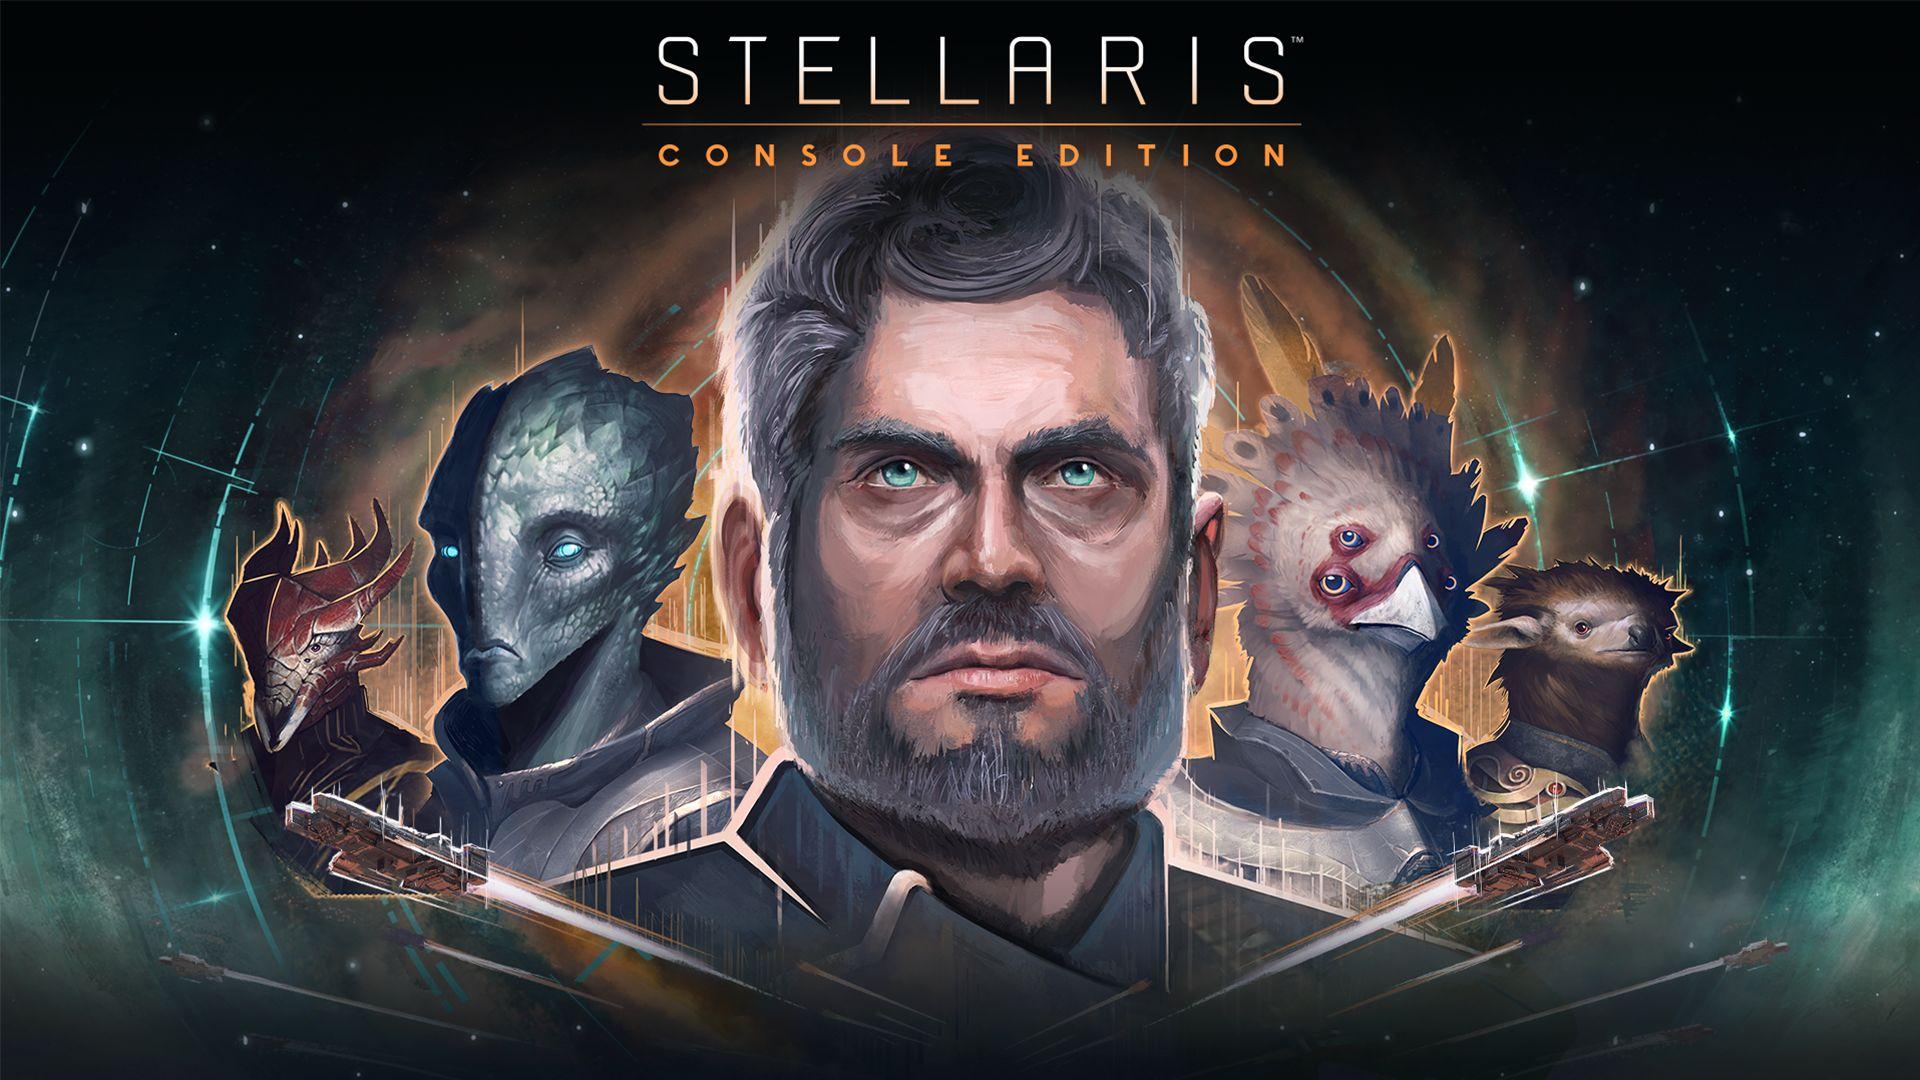 Stellaris dolazi na konzole